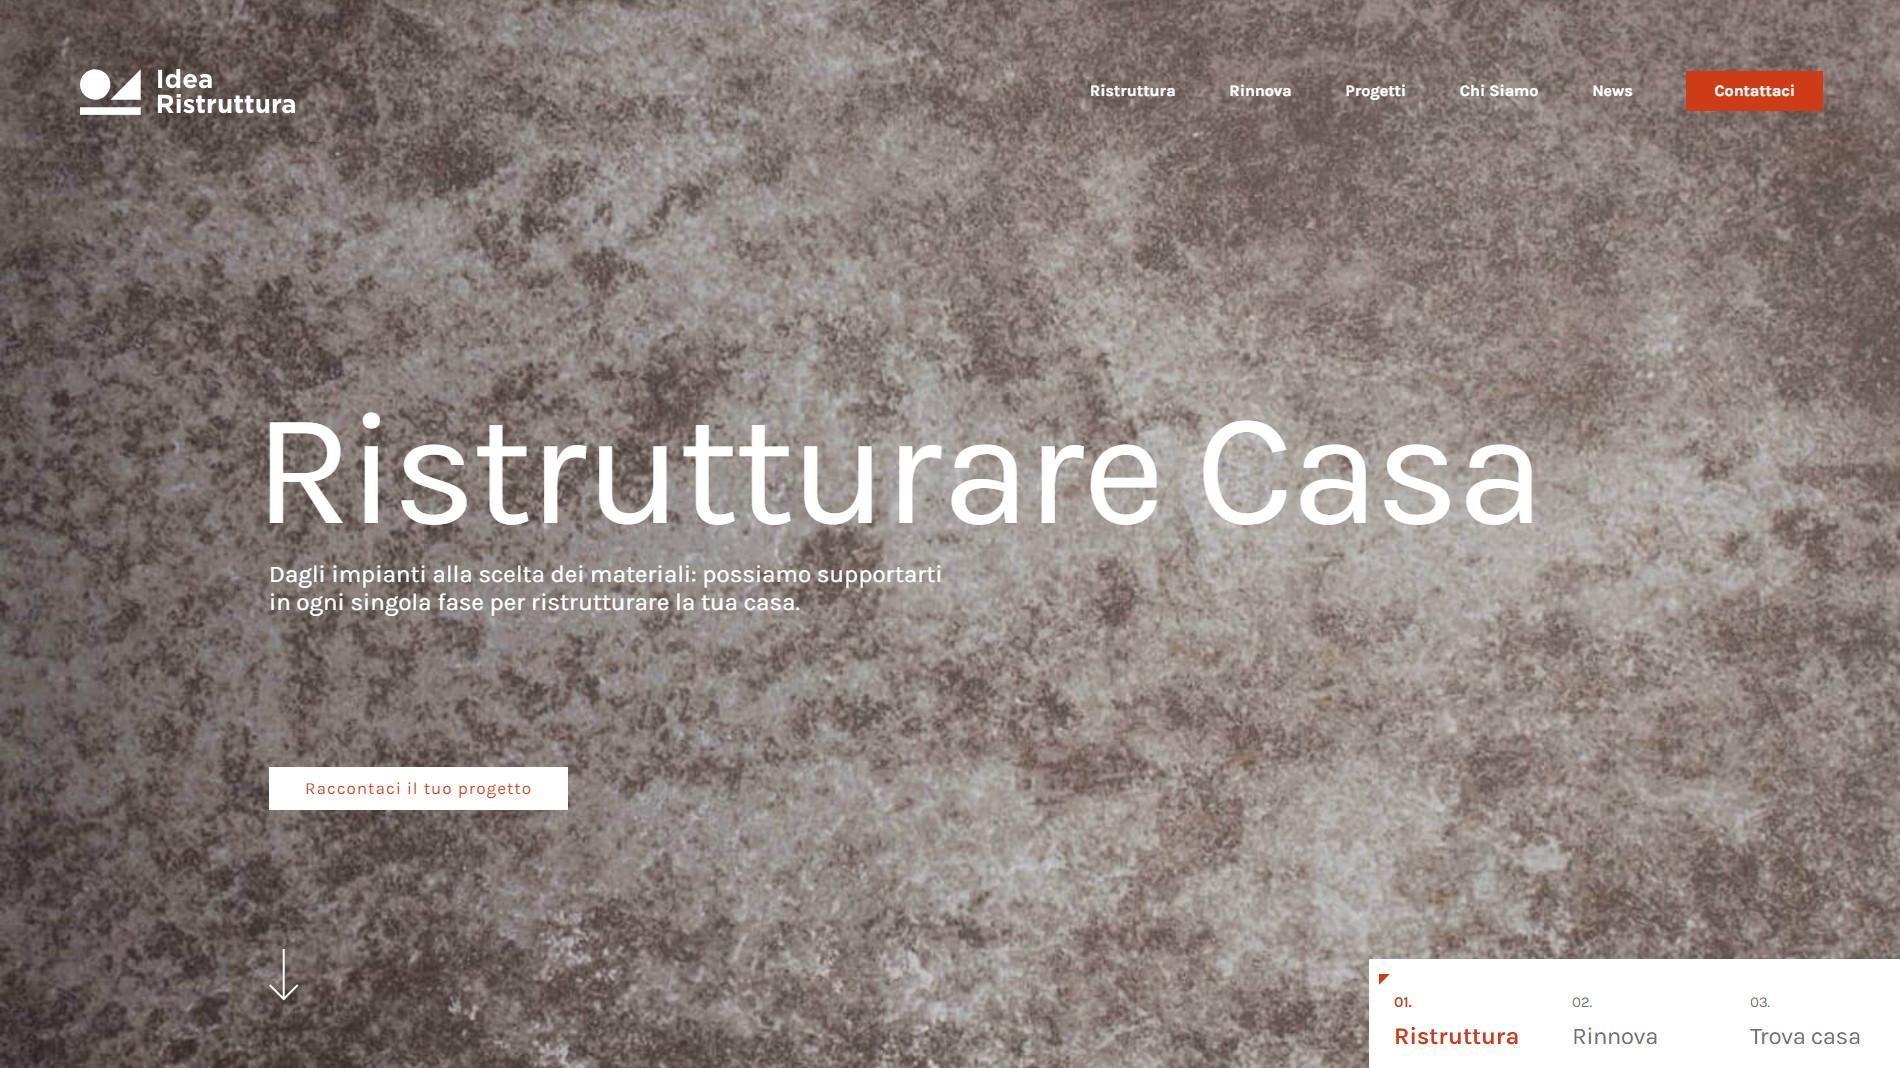 idea-ristruttura